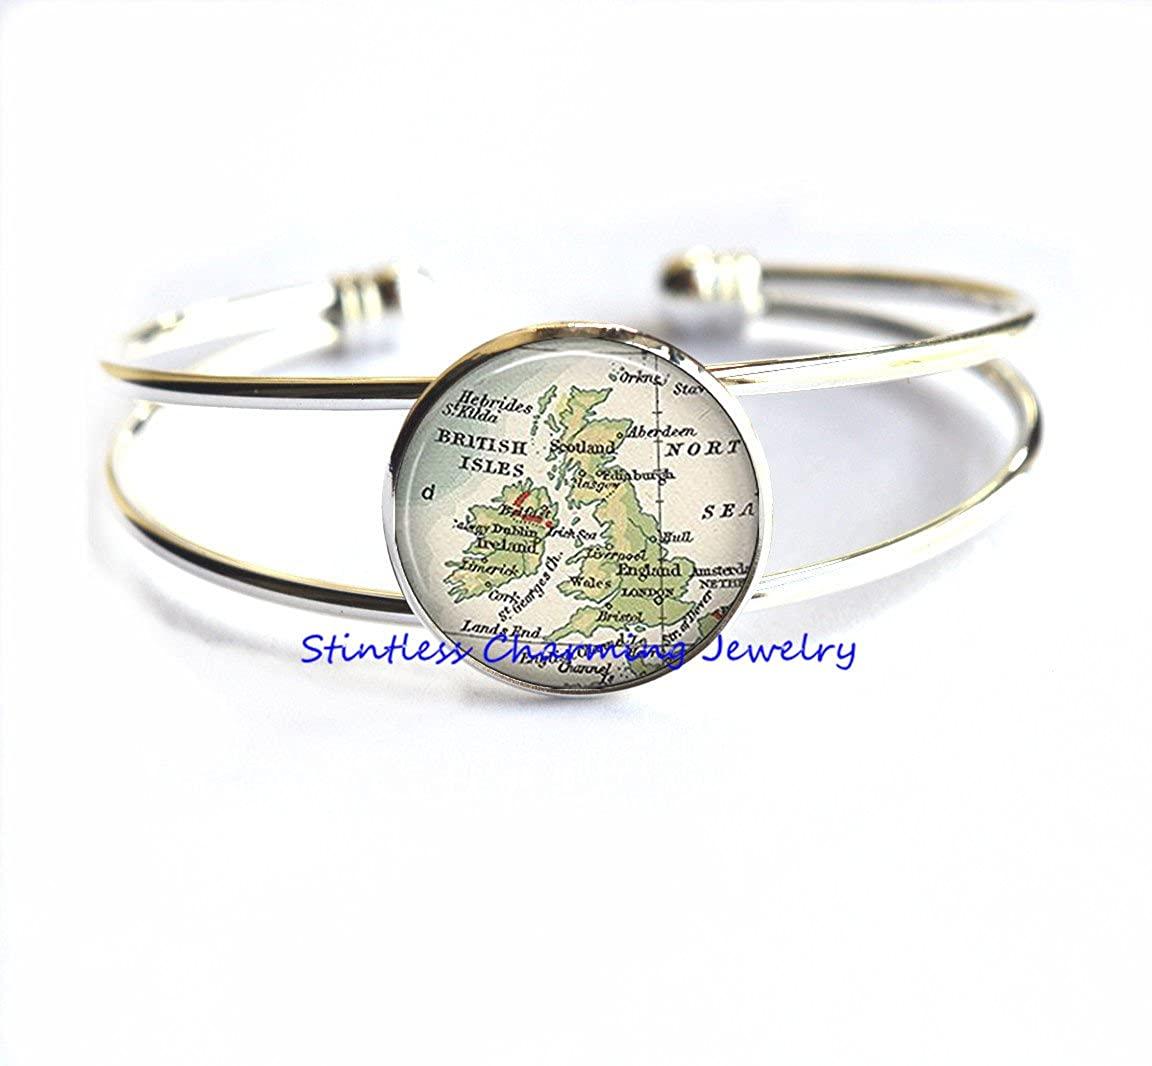 stintless charming Jewelry British Isles map Bracelet, England map Bracelets, Great Britain map Bracelets, England map Bracelet,British Map Bracelet